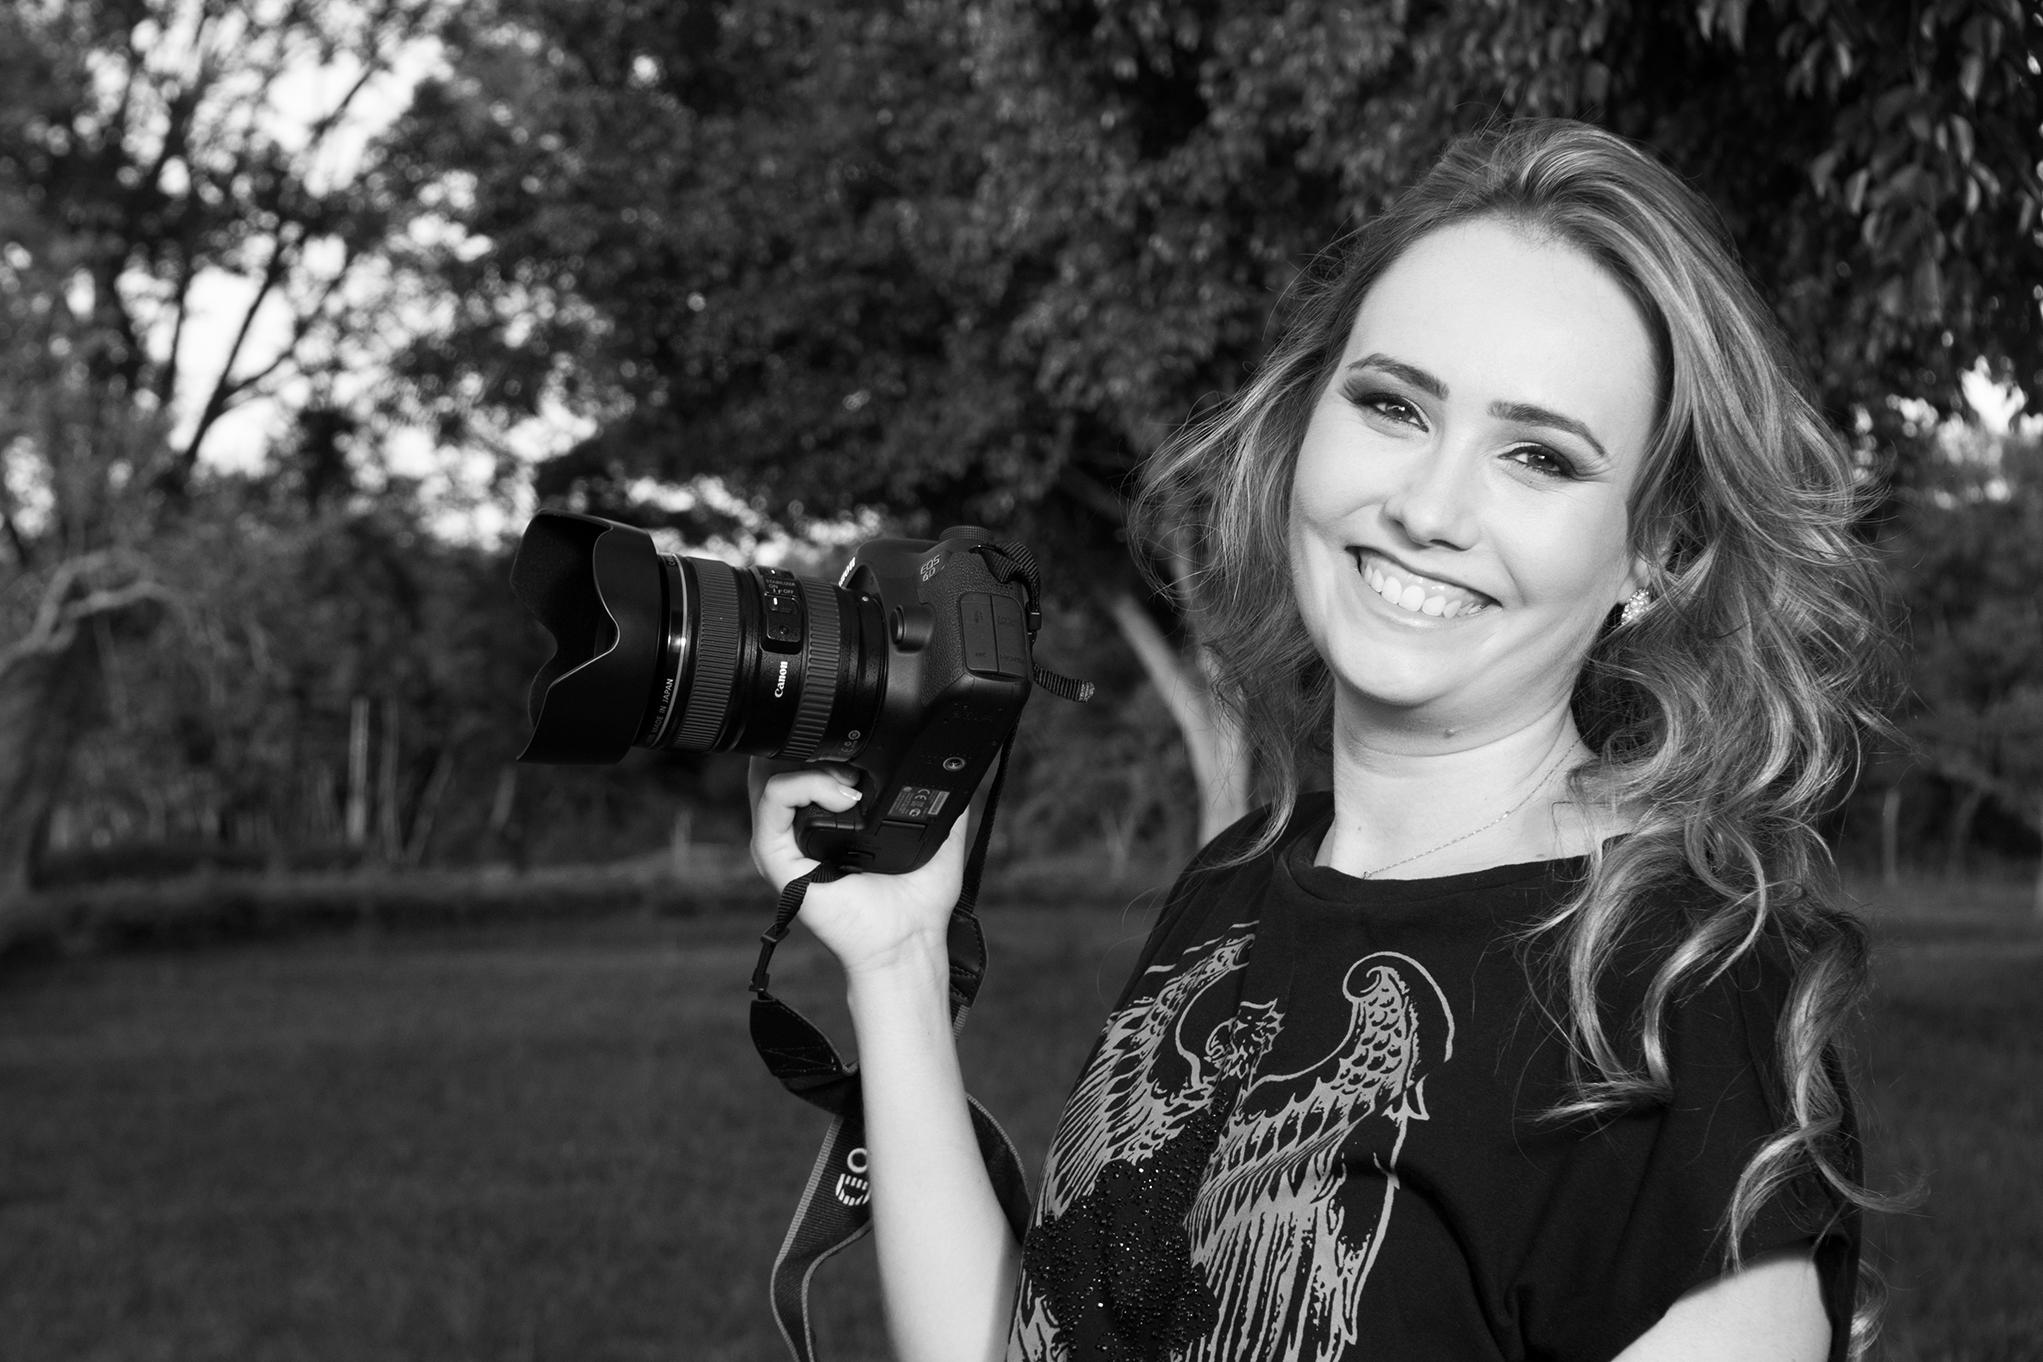 Sobre Fotógrafos de casamento e família Danielle Bazzanella de Foz do Iguaçu-PR para o mundo